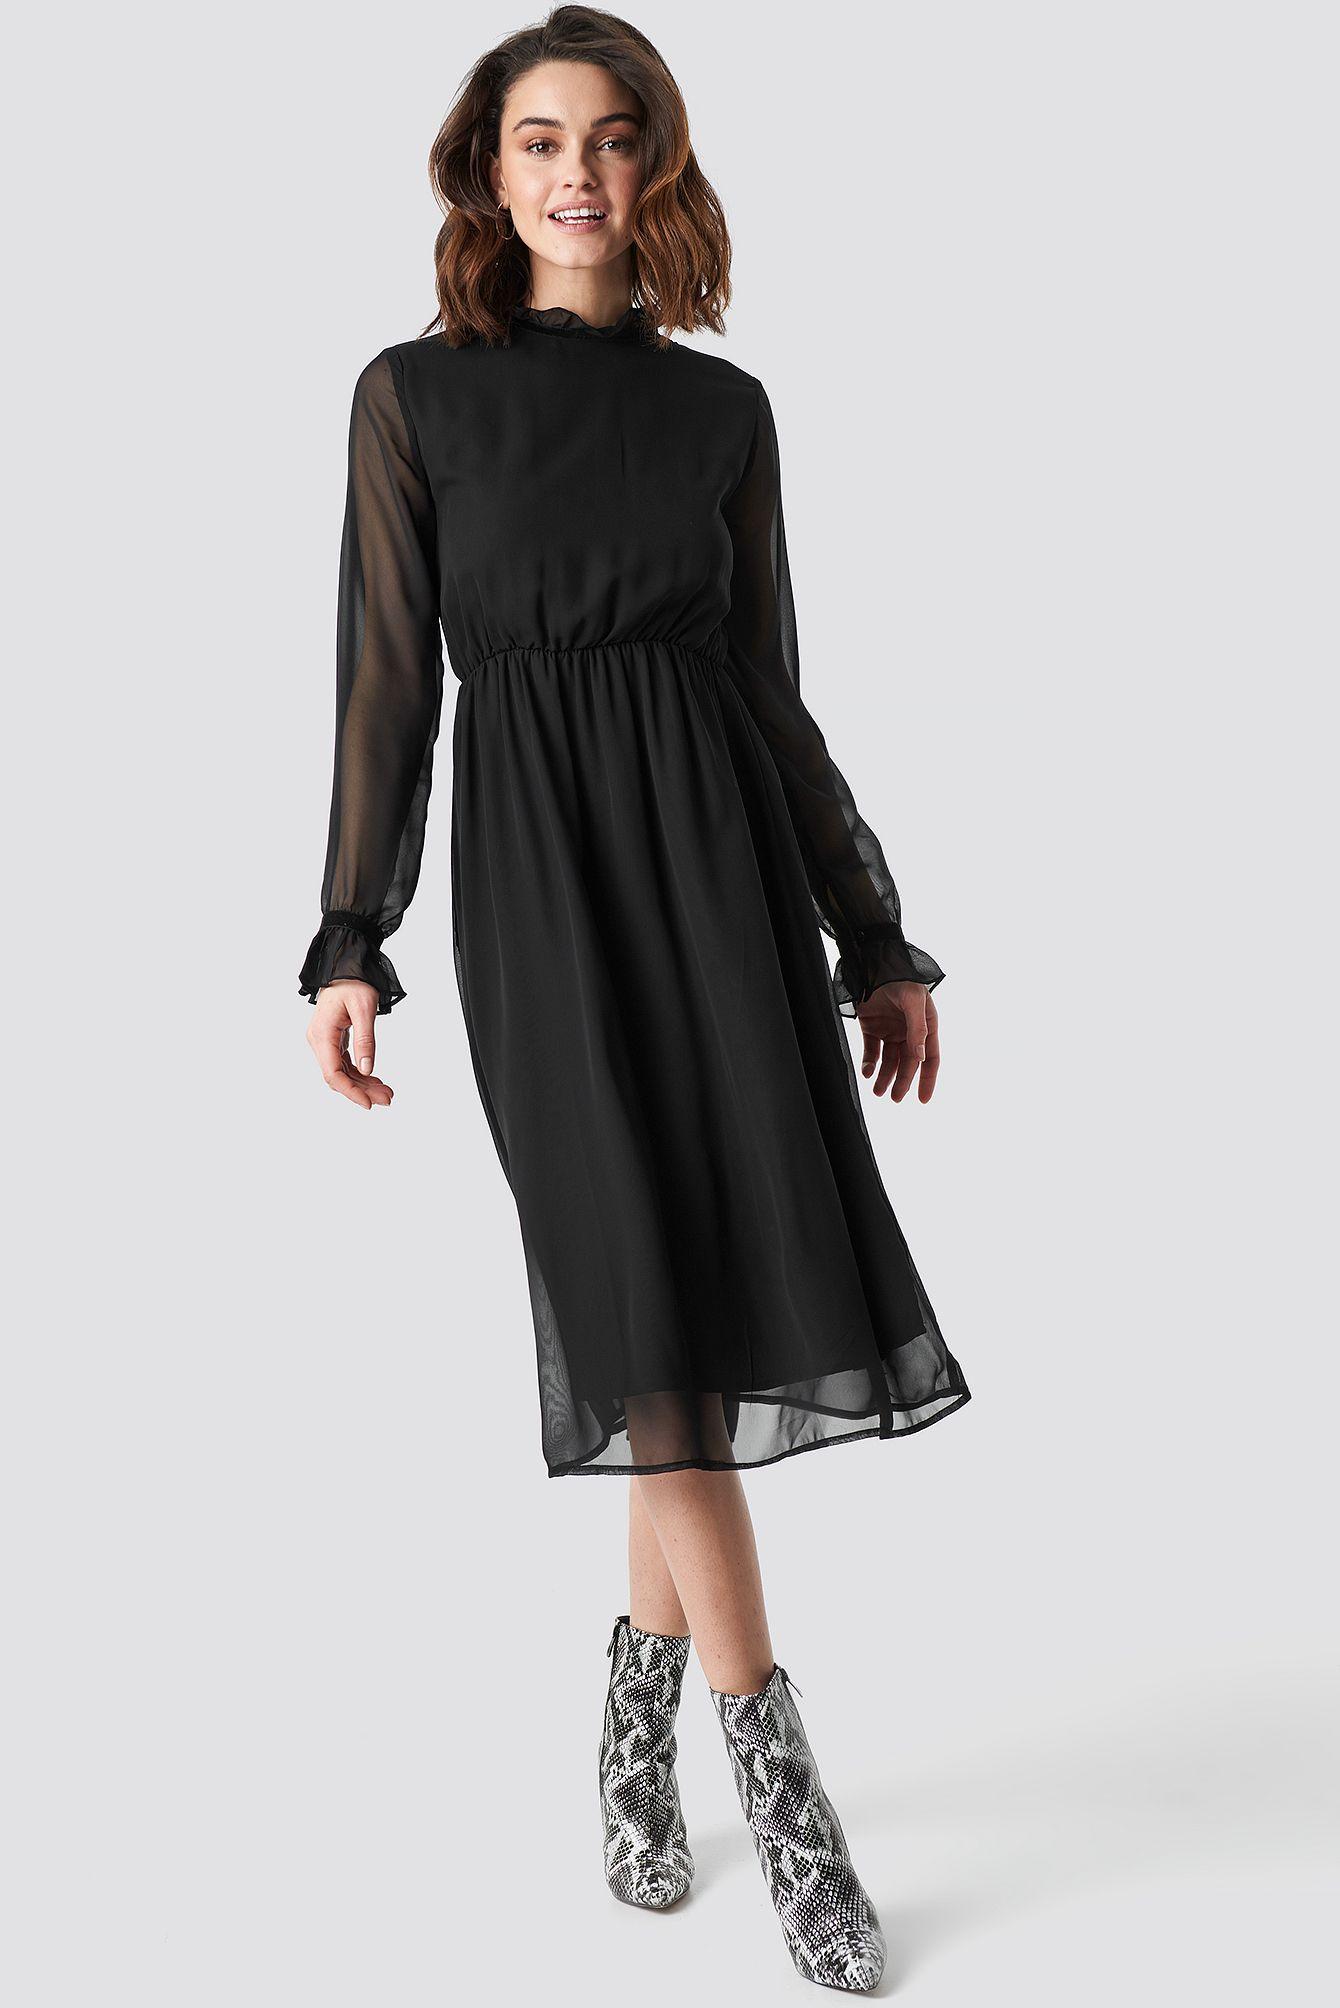 Ruffle Hem Dobby Chiffon Mini Dress Boohoo Australia In 2020 Long Sleeve Cocktail Dress Boho Dress Short Mini Dress [ 1500 x 1000 Pixel ]